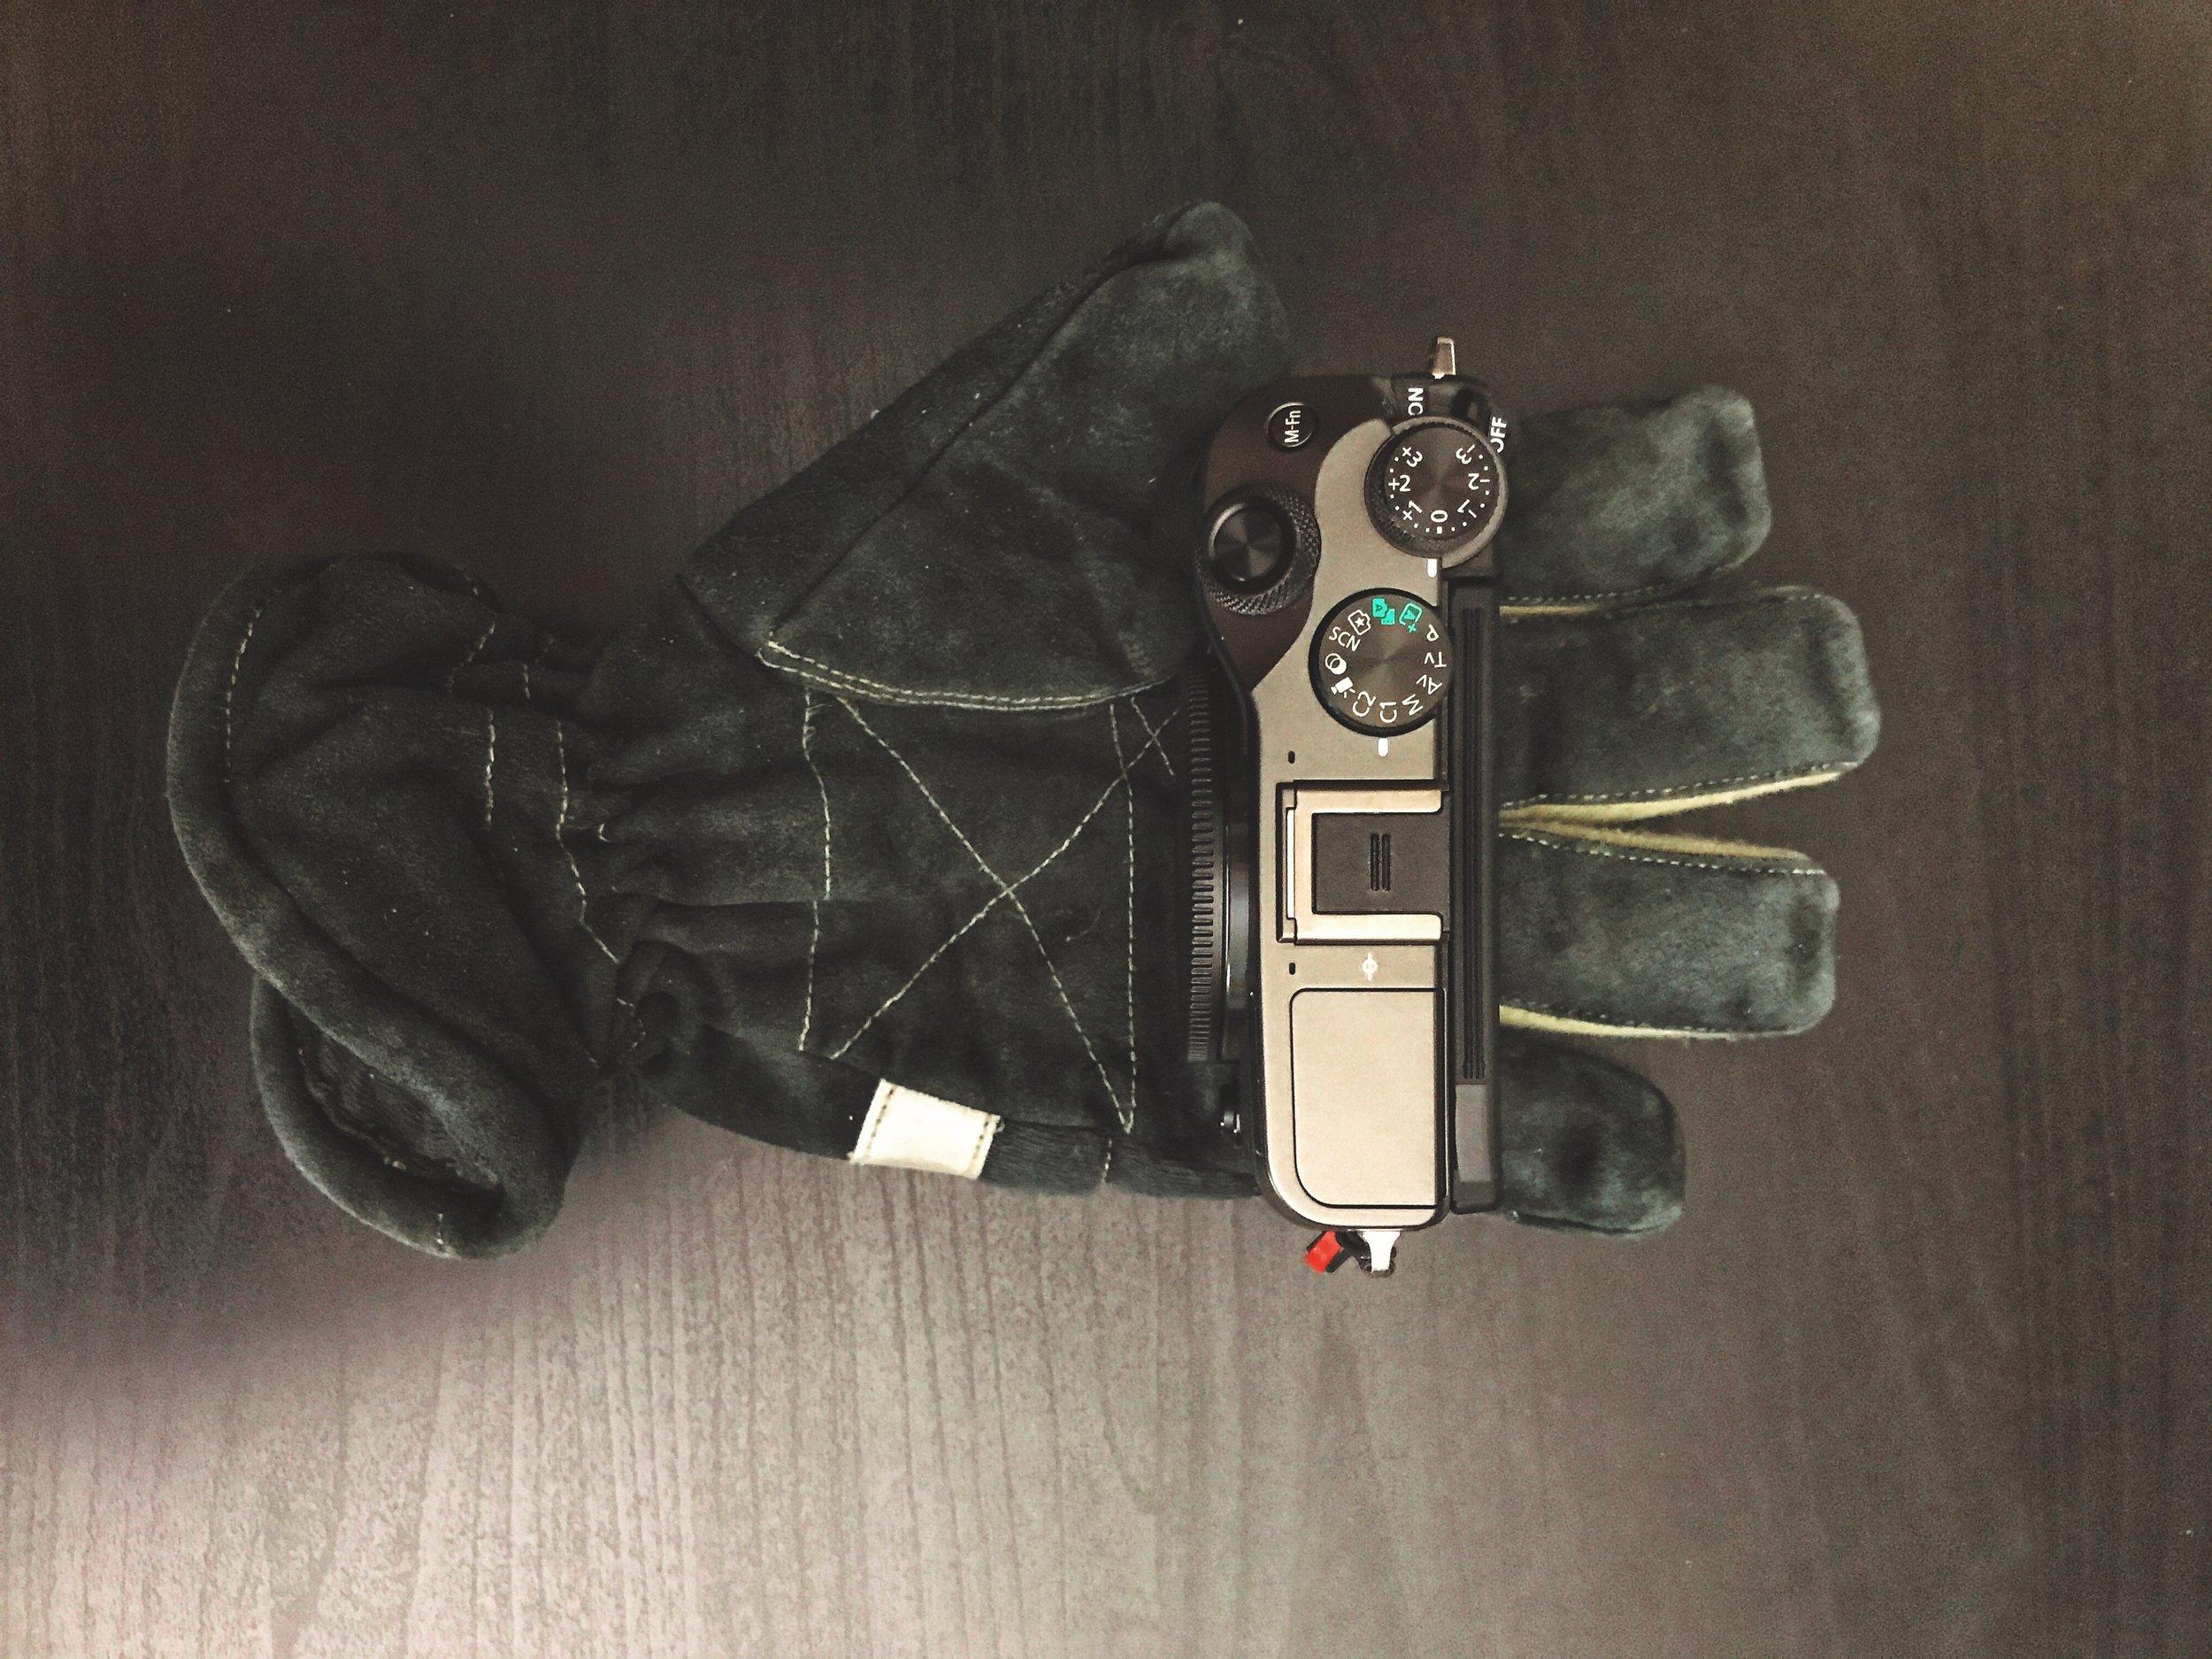 M6 in medium sized fire fighting glove.